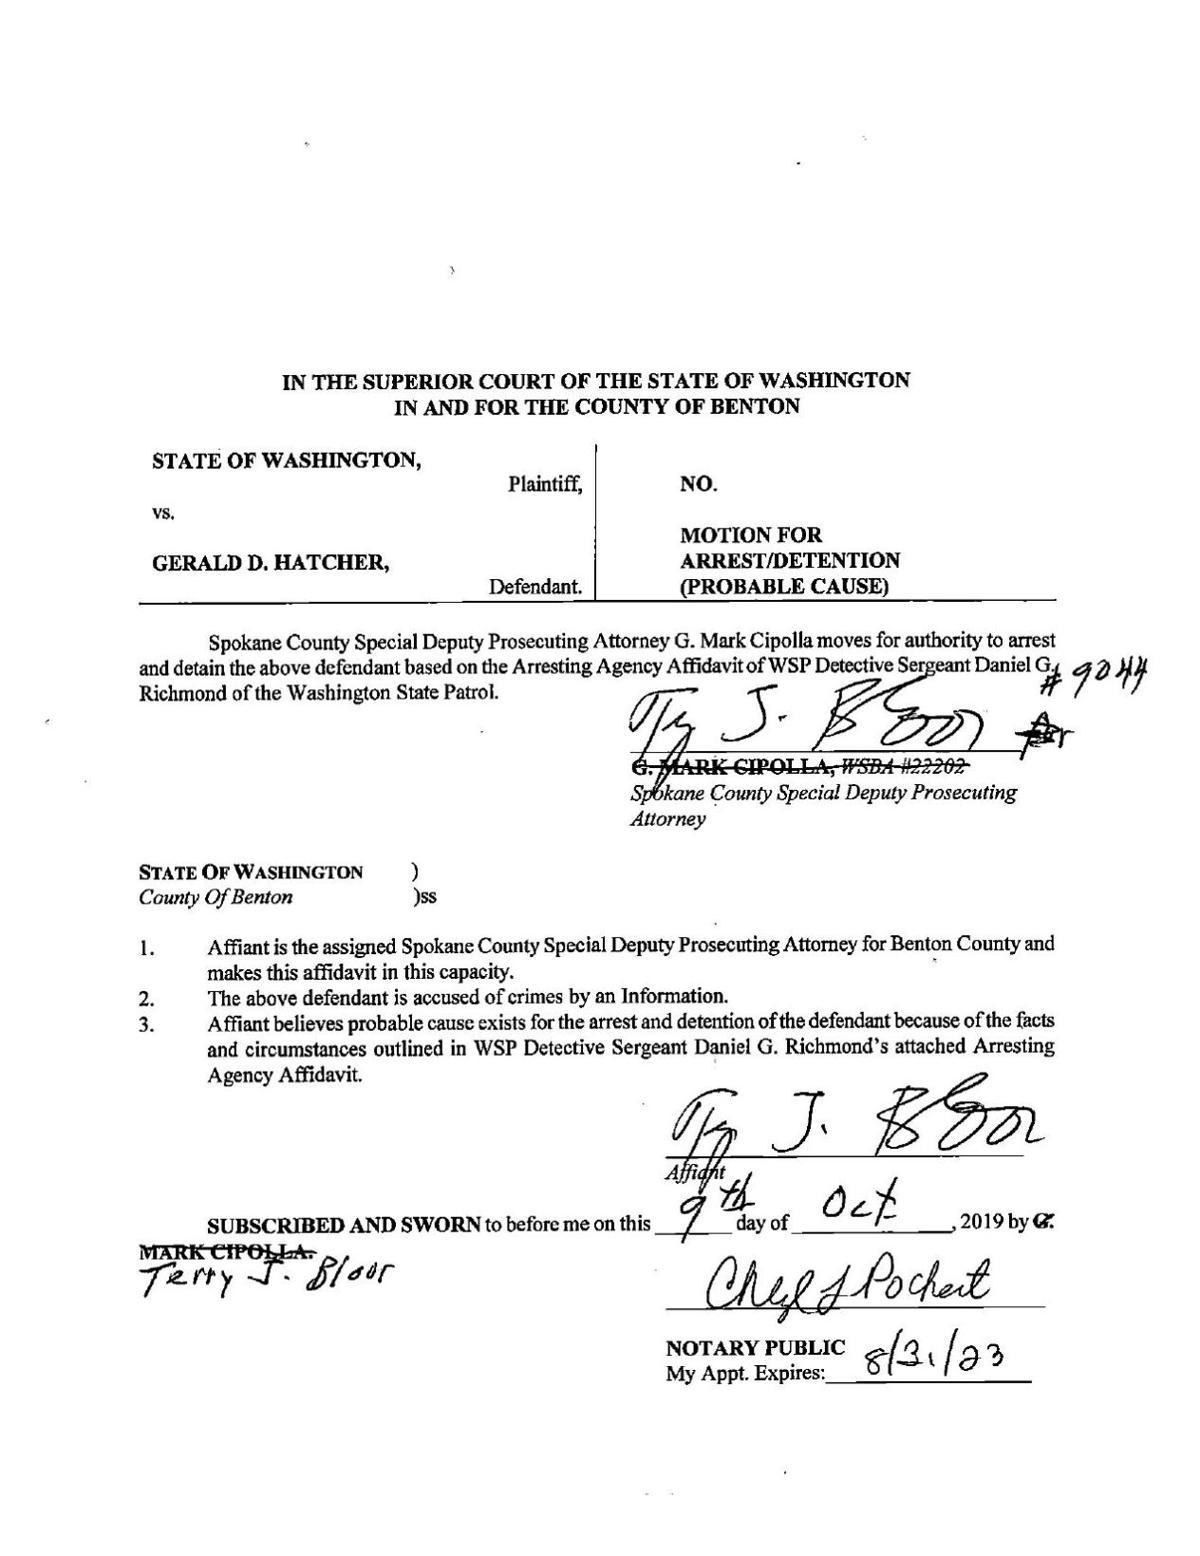 Motion for Arrest/Detention (Probable Cause)